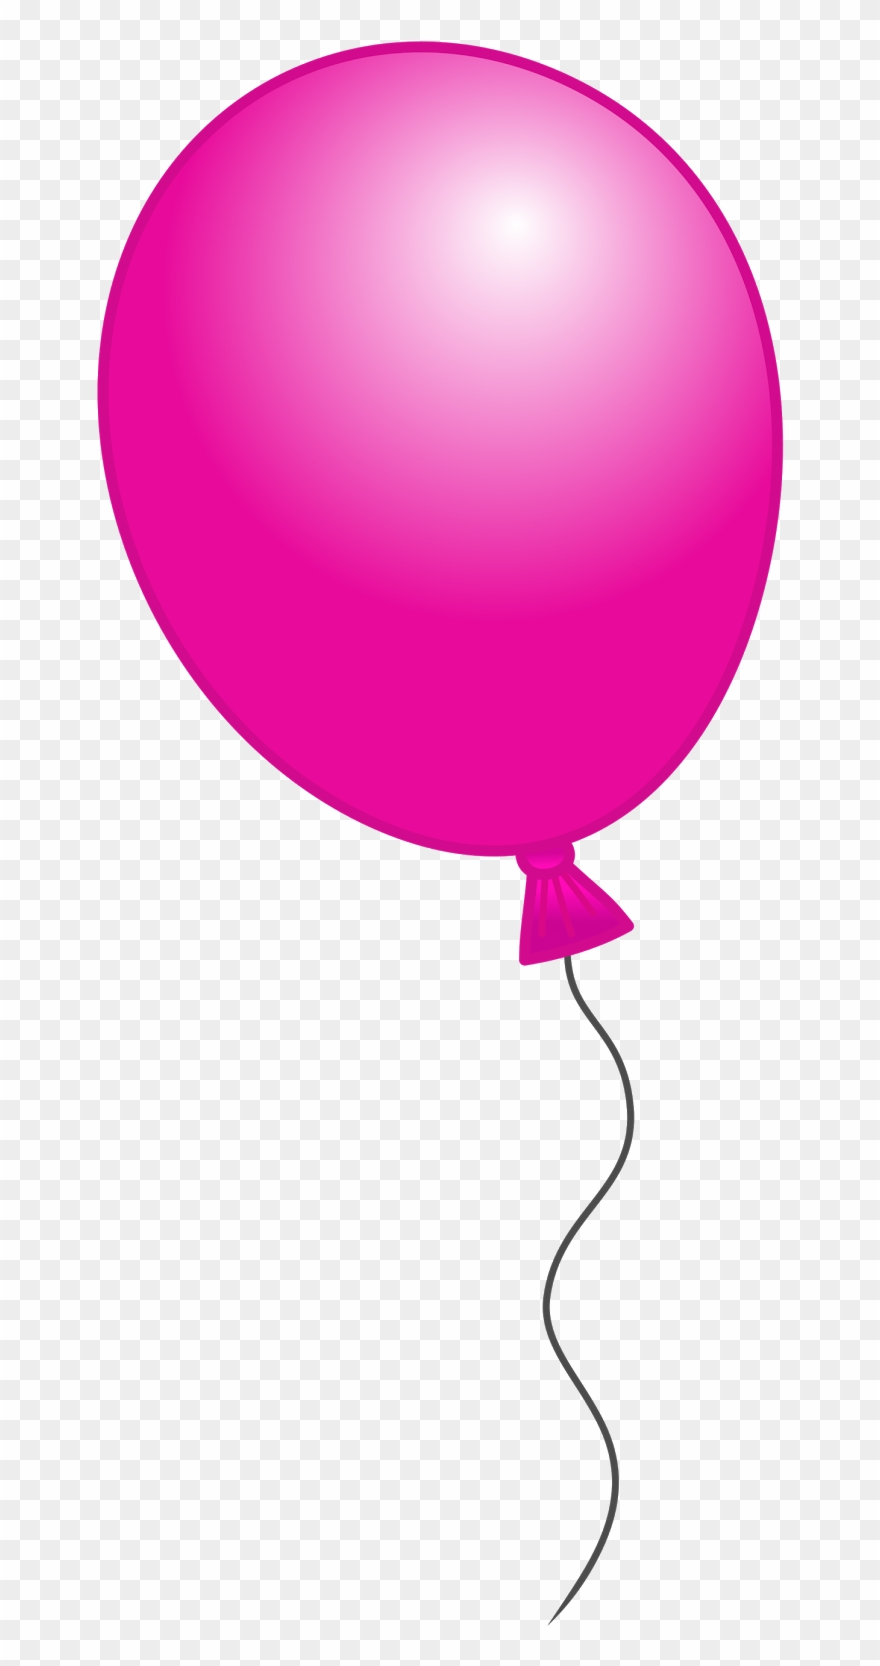 Free clip art pink. Balloon clipart transparent background